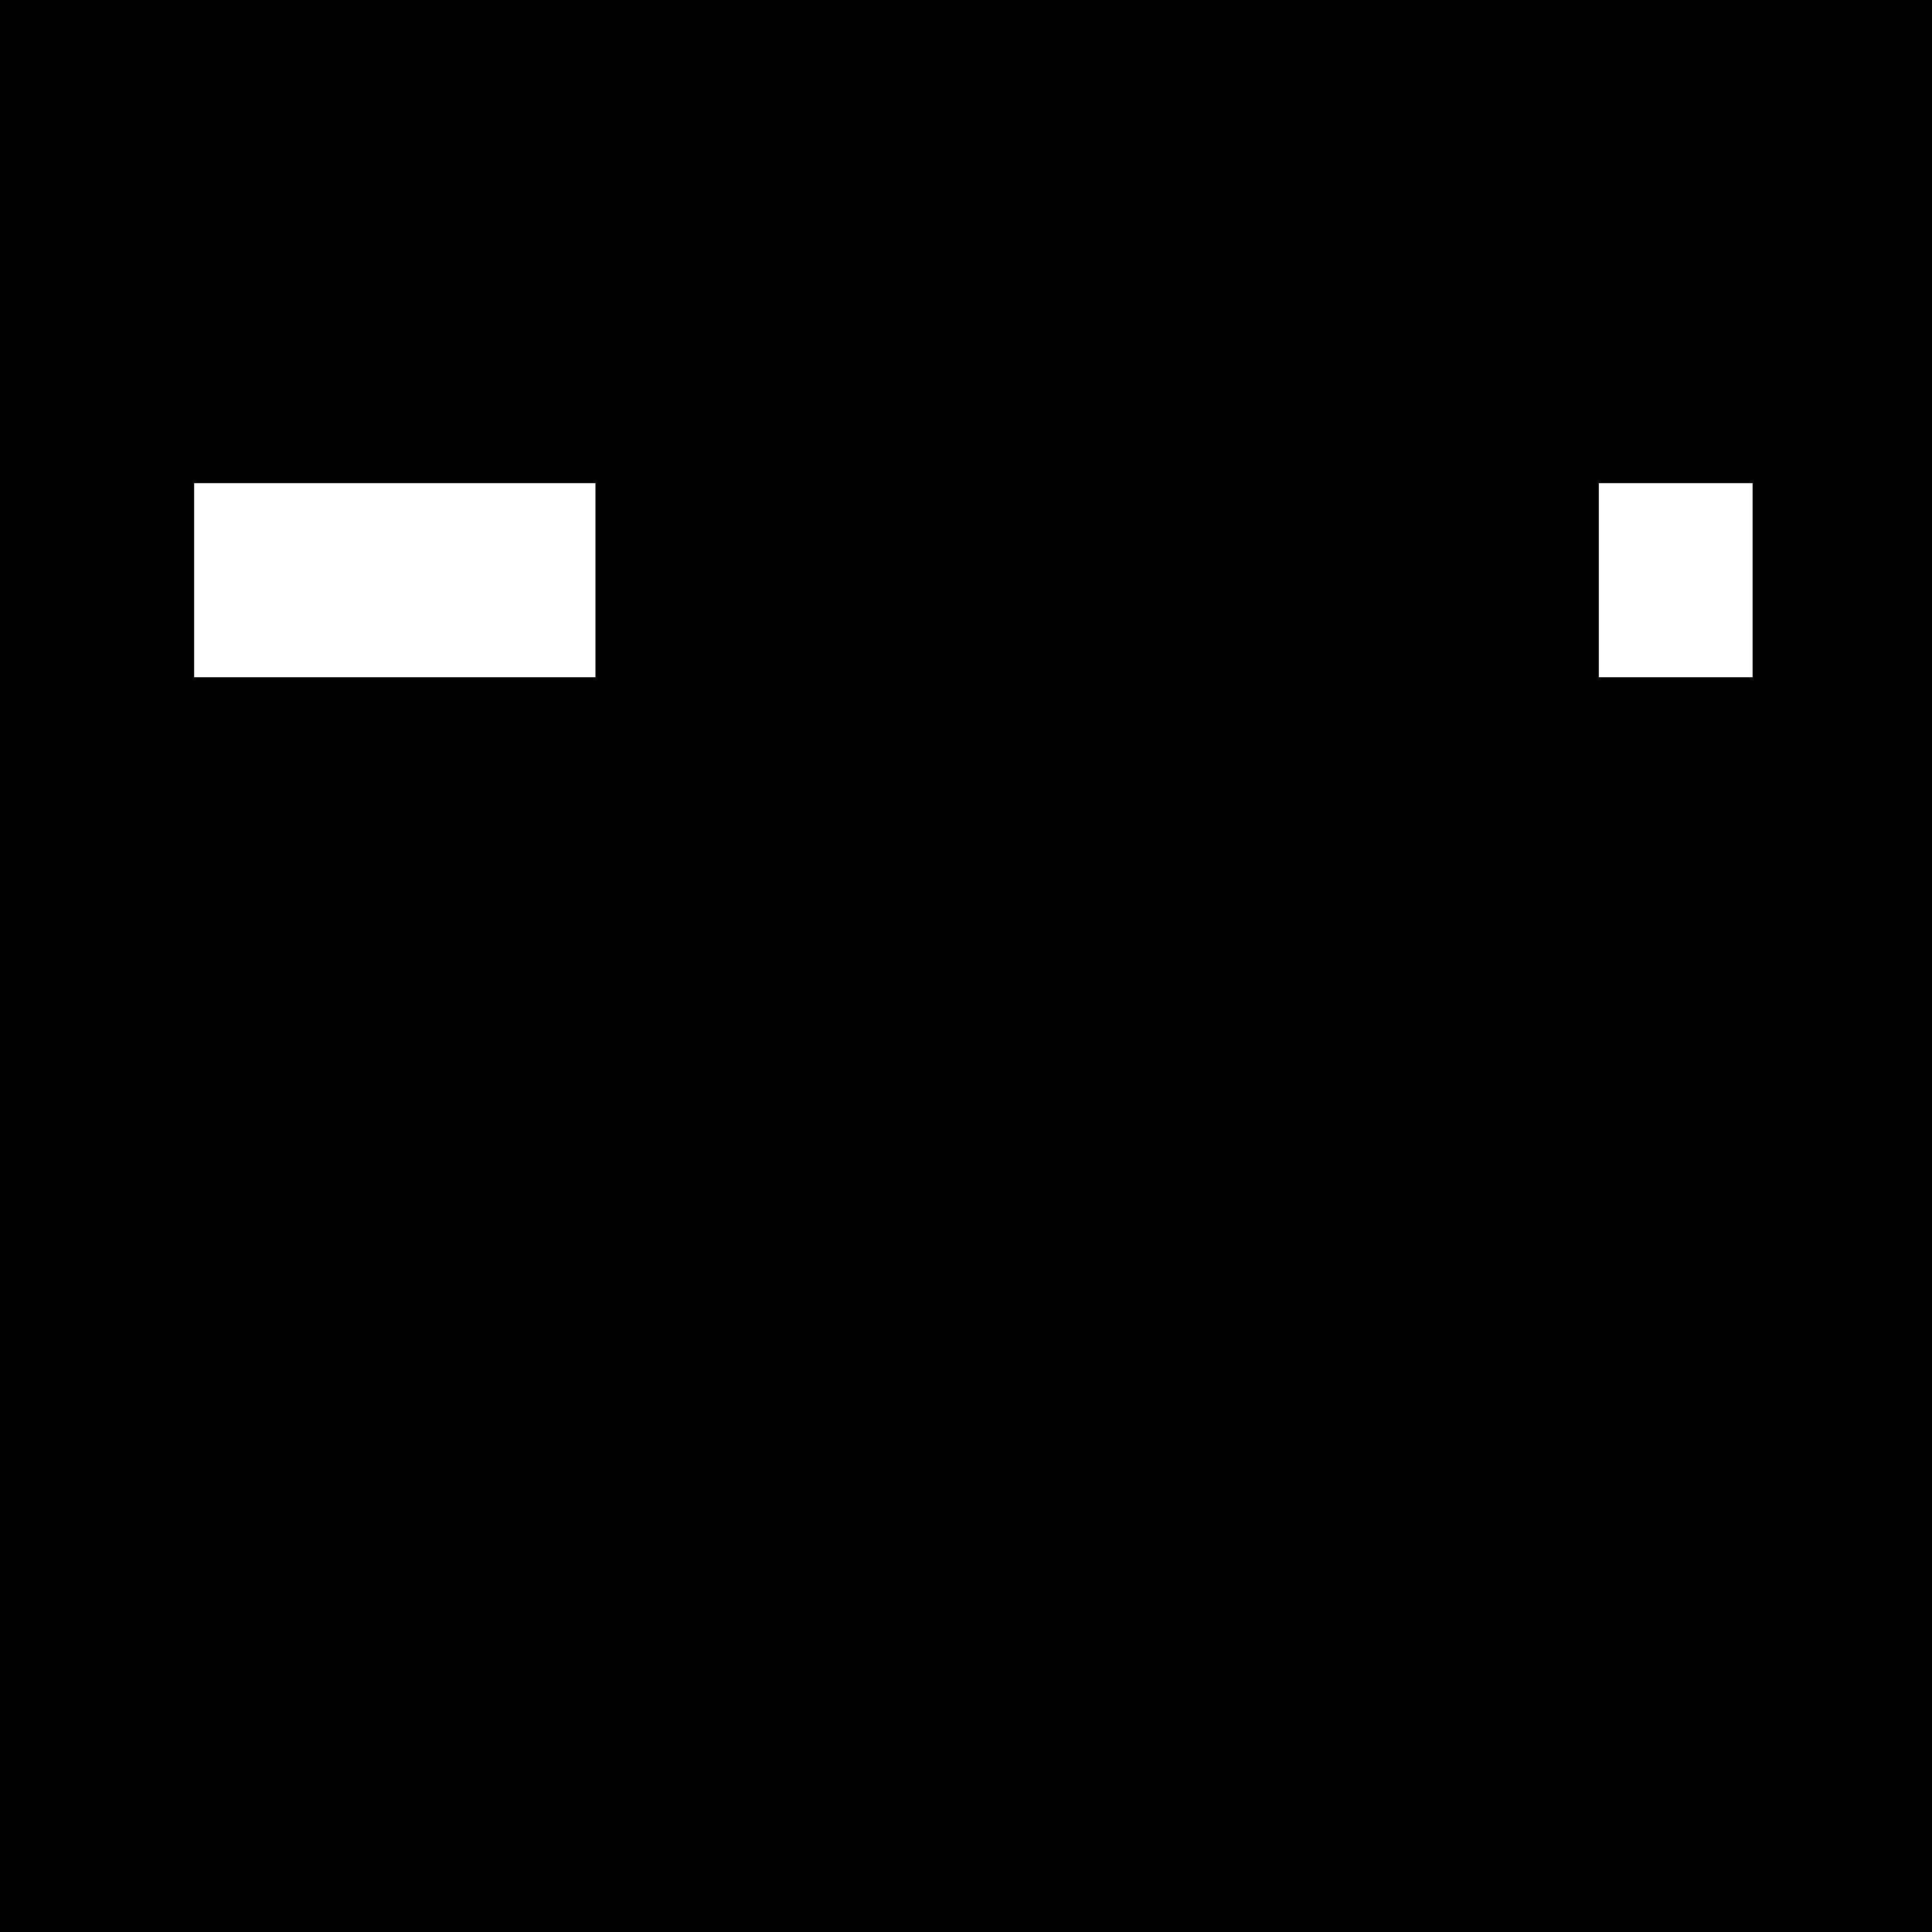 Copia de logo 1